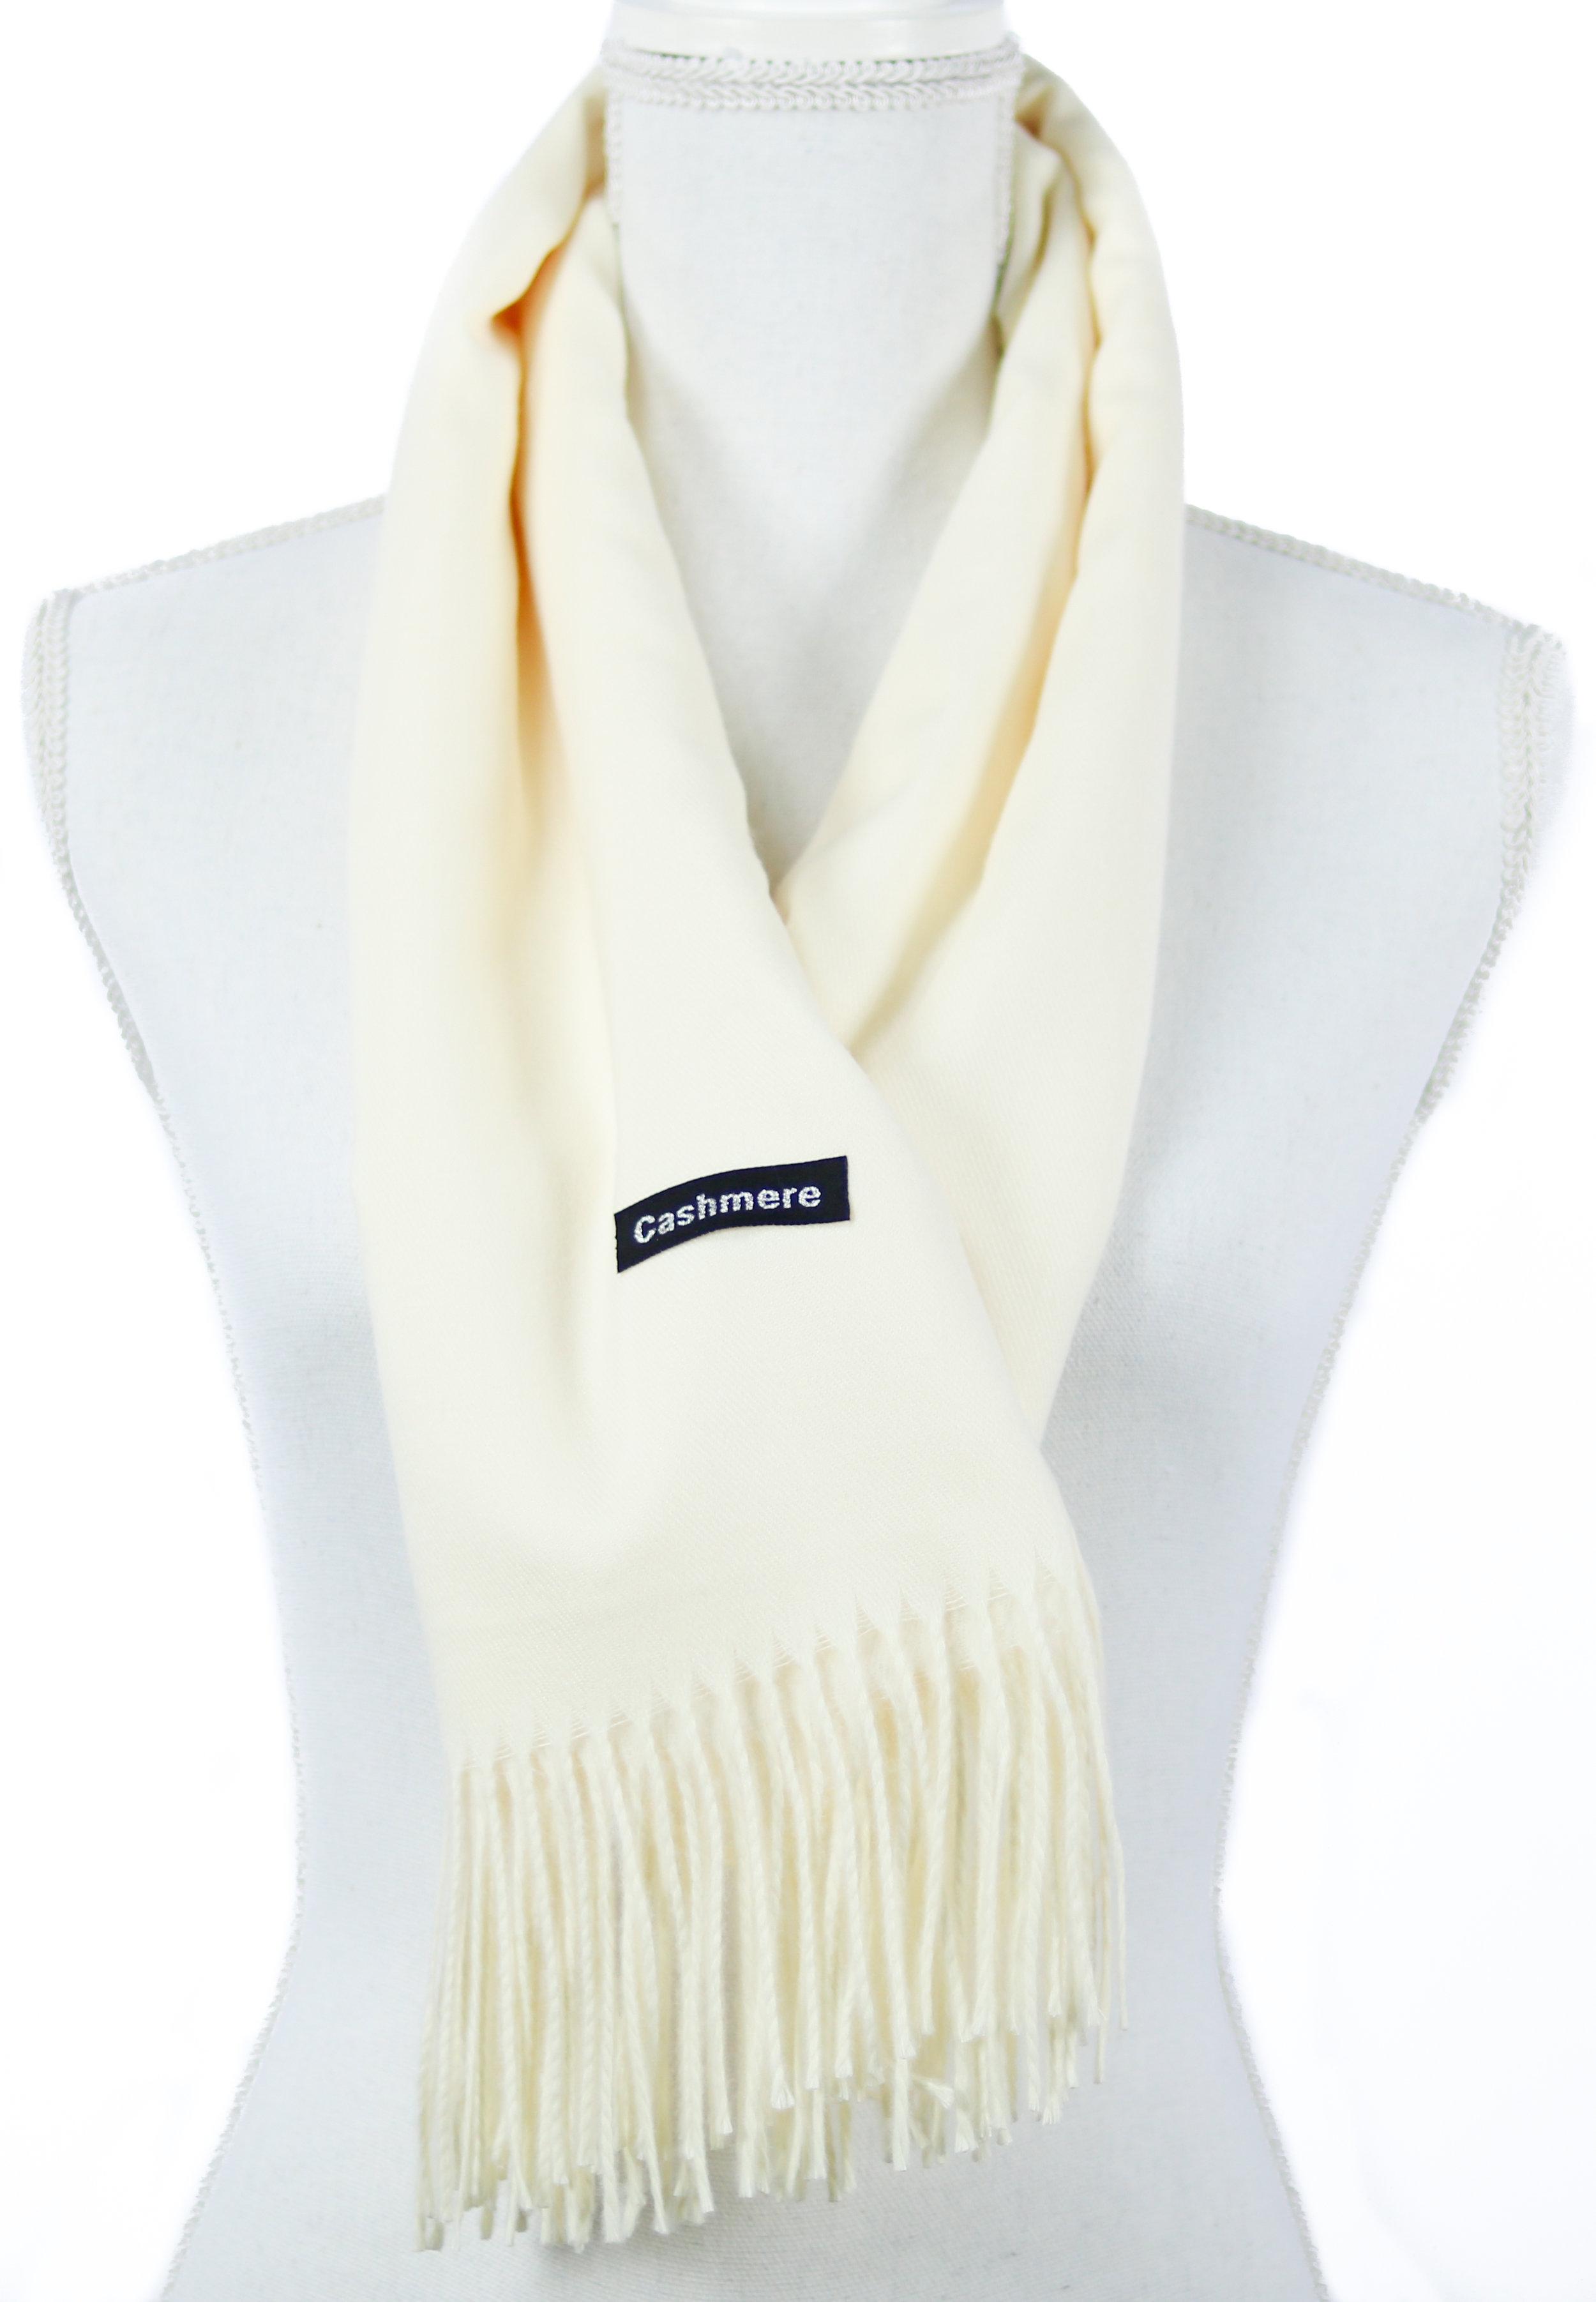 5504dc6ee Peruvian Cashmere - Women Shawl - Cashmere Shawls - White Shawl - Cachemira  Pashmina - - Gift for Woman - Pashminas - Women Wraps